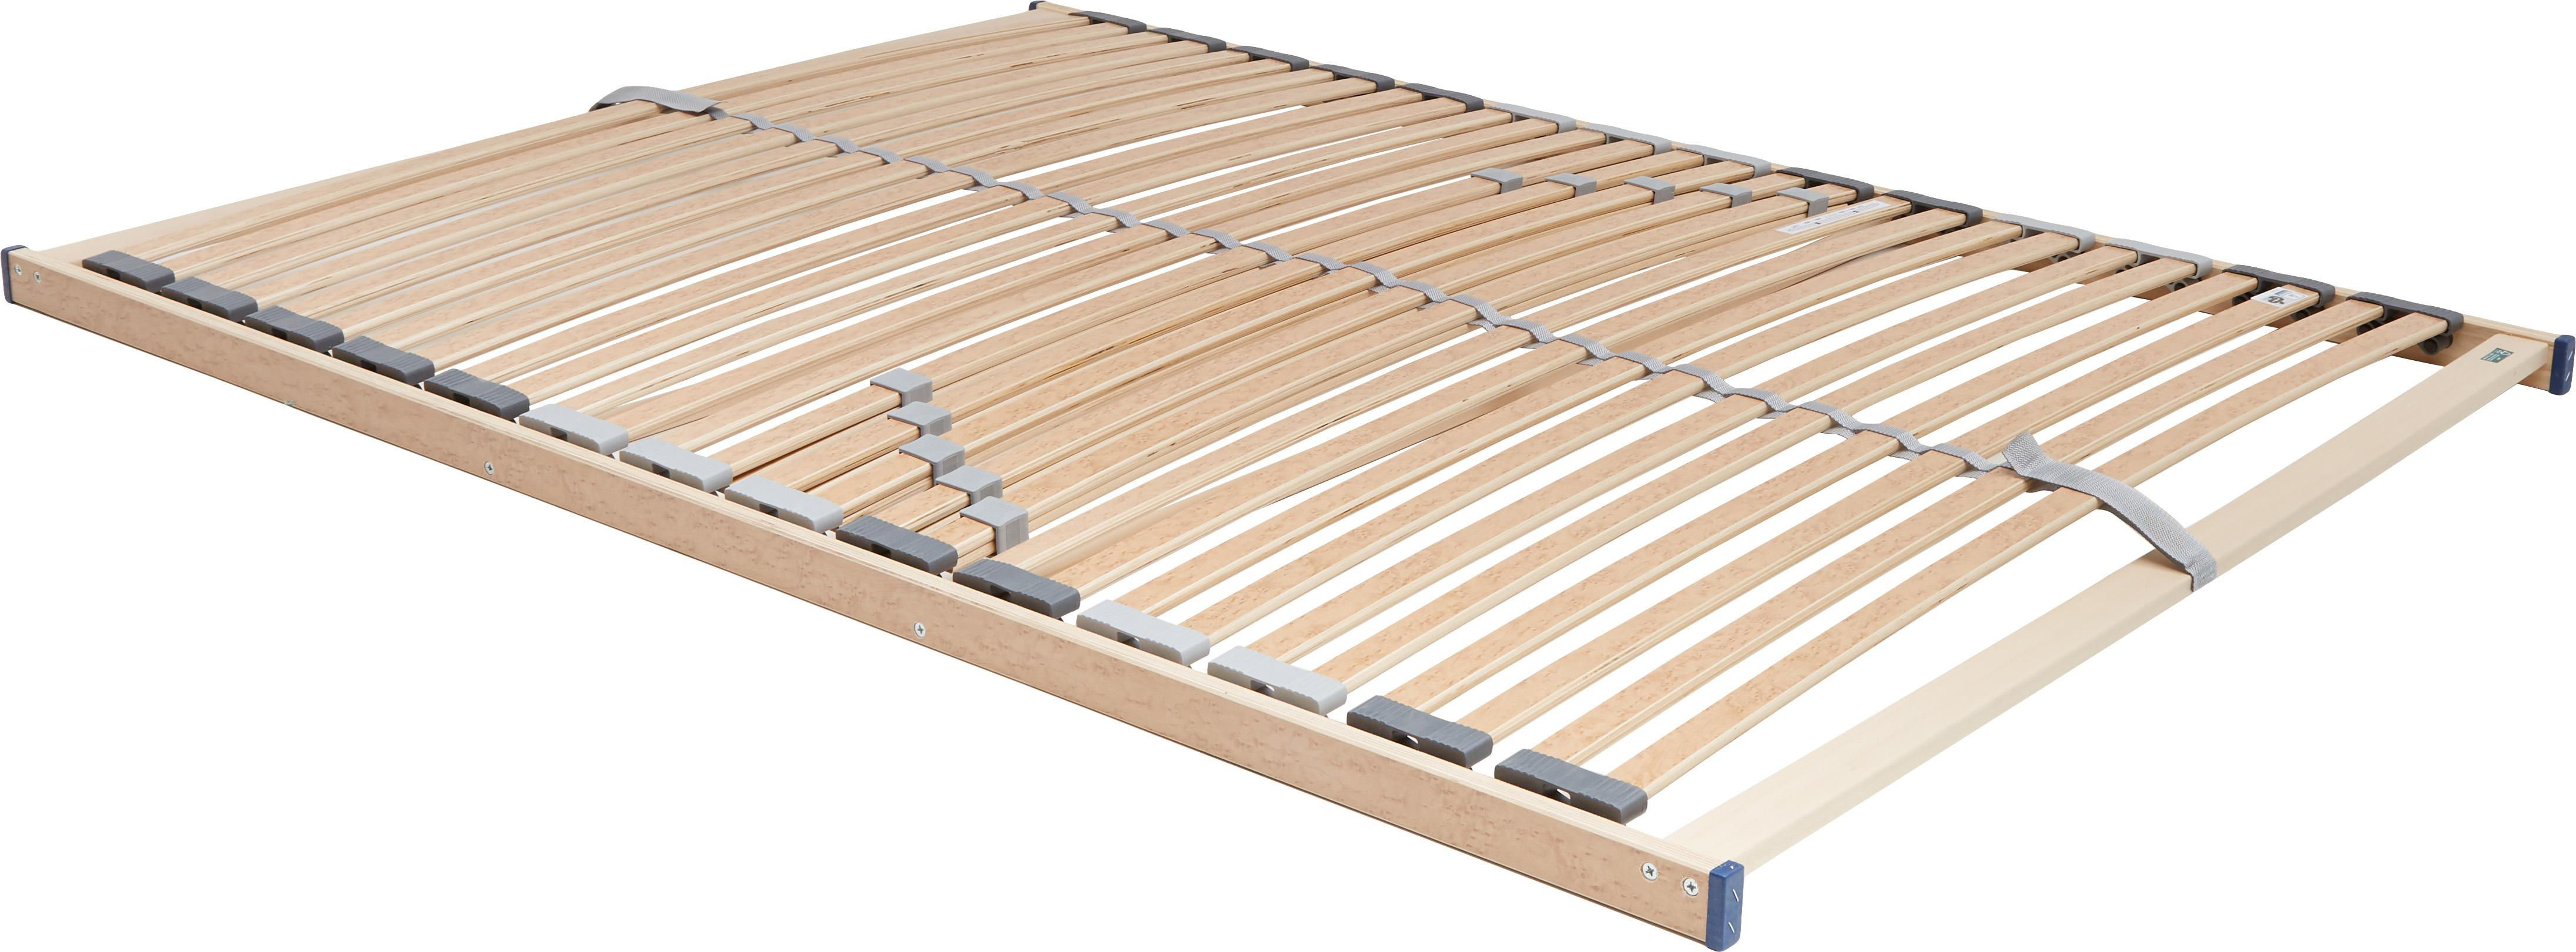 Lattenrost Comfort Plus, Rahmen: Schichtholz, Metall, Leisten: Federholzleisten mit Wurz, Mittelgurt: Kunstfaser, Kappen: Kunststoff, Hellbraun, 140 x 200 cm